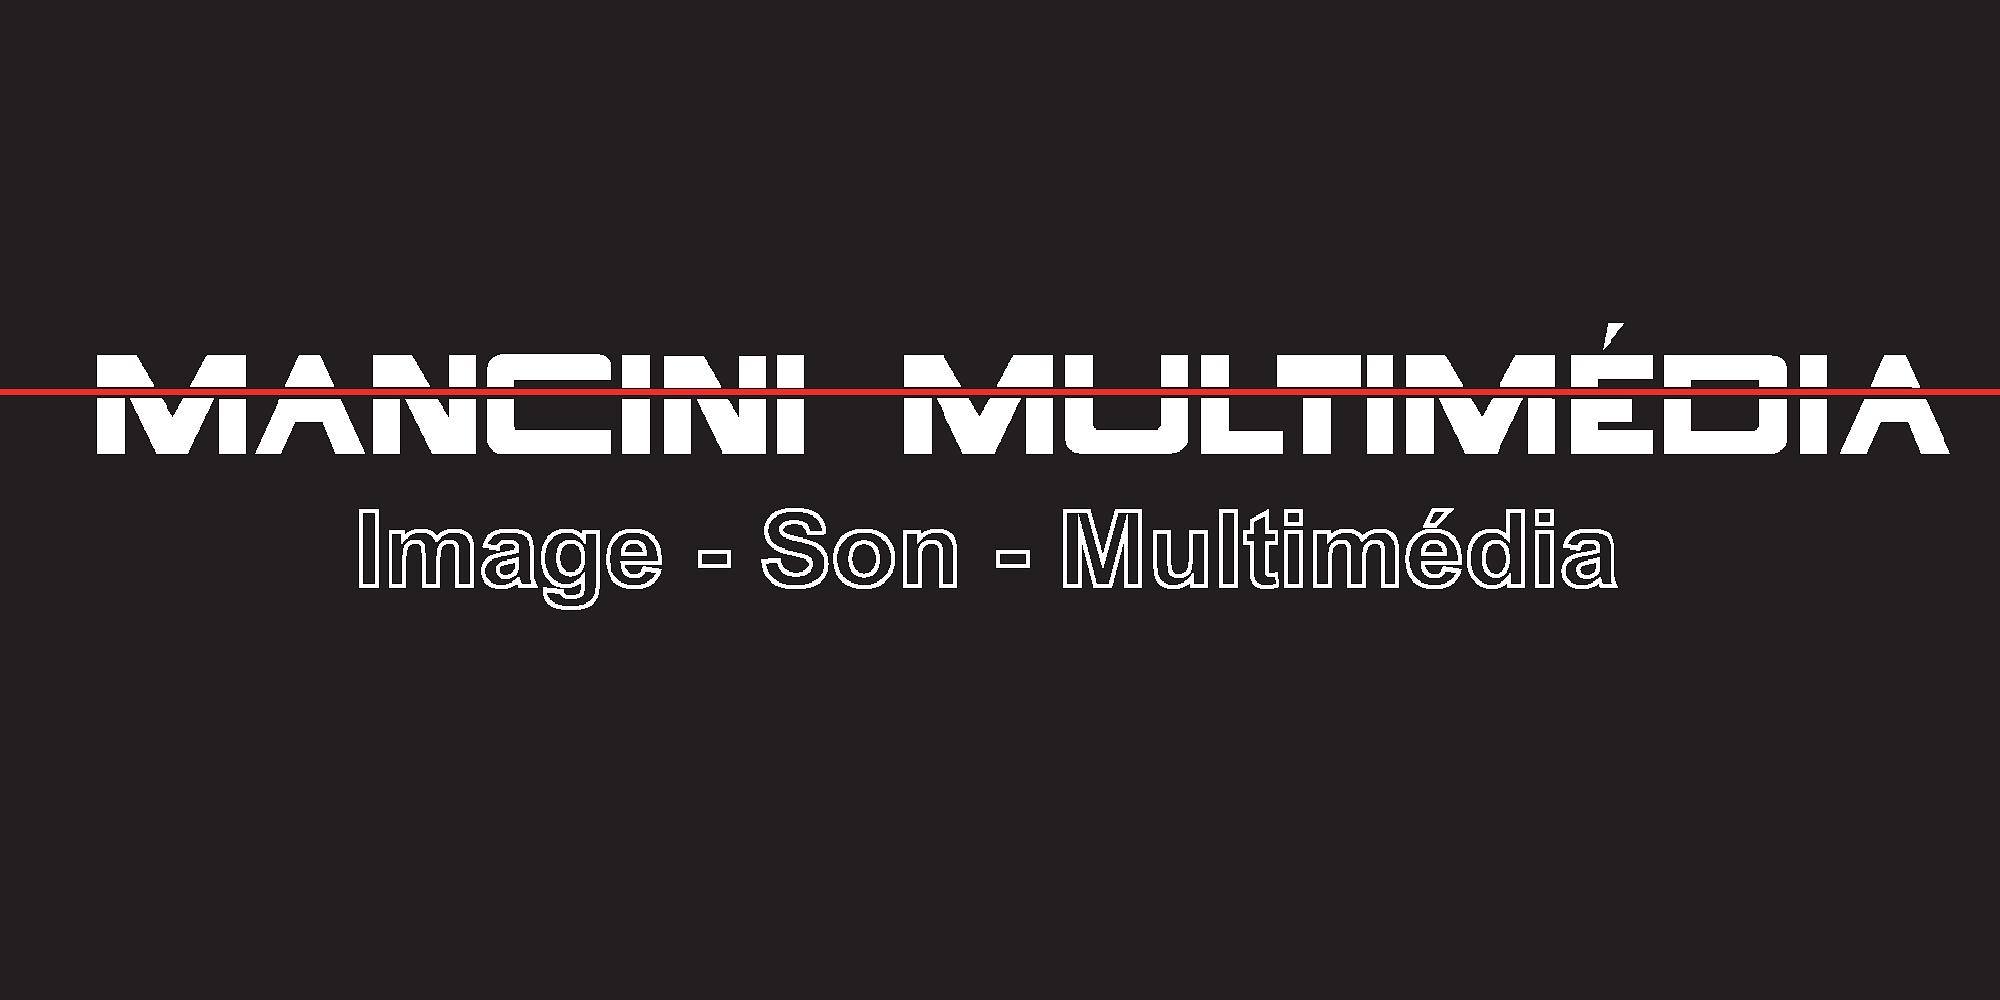 Mancini Multimédia